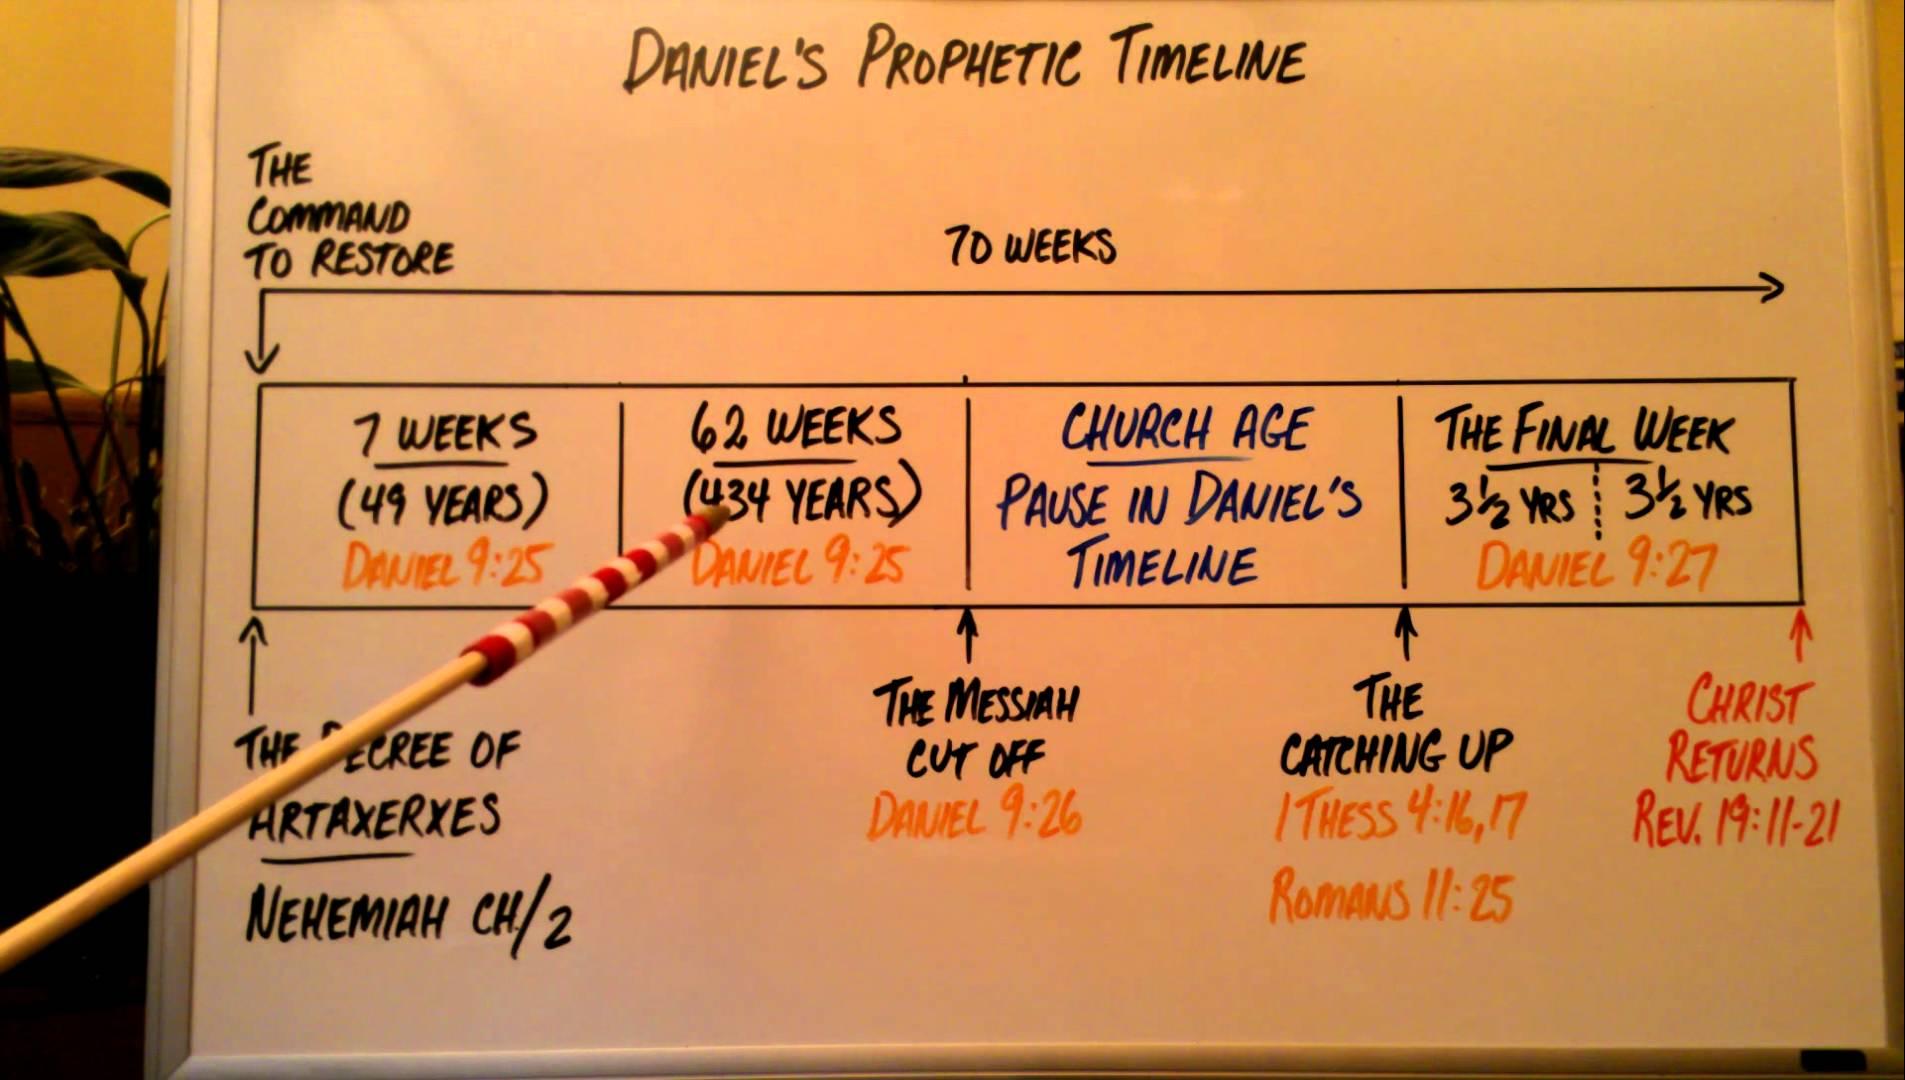 pophetic timeline